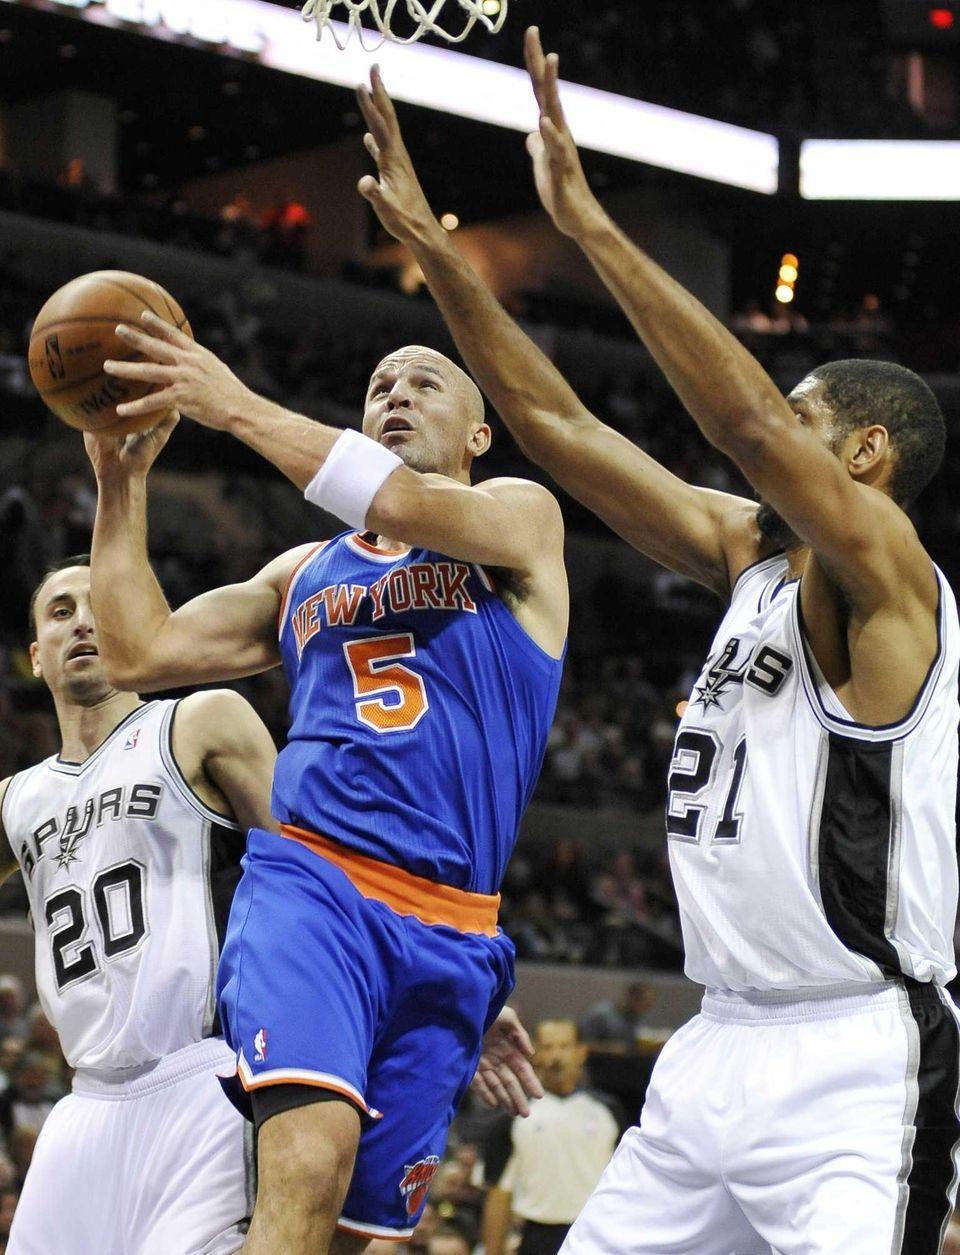 Jason Kidd shoots over San Antonio Spurs forward